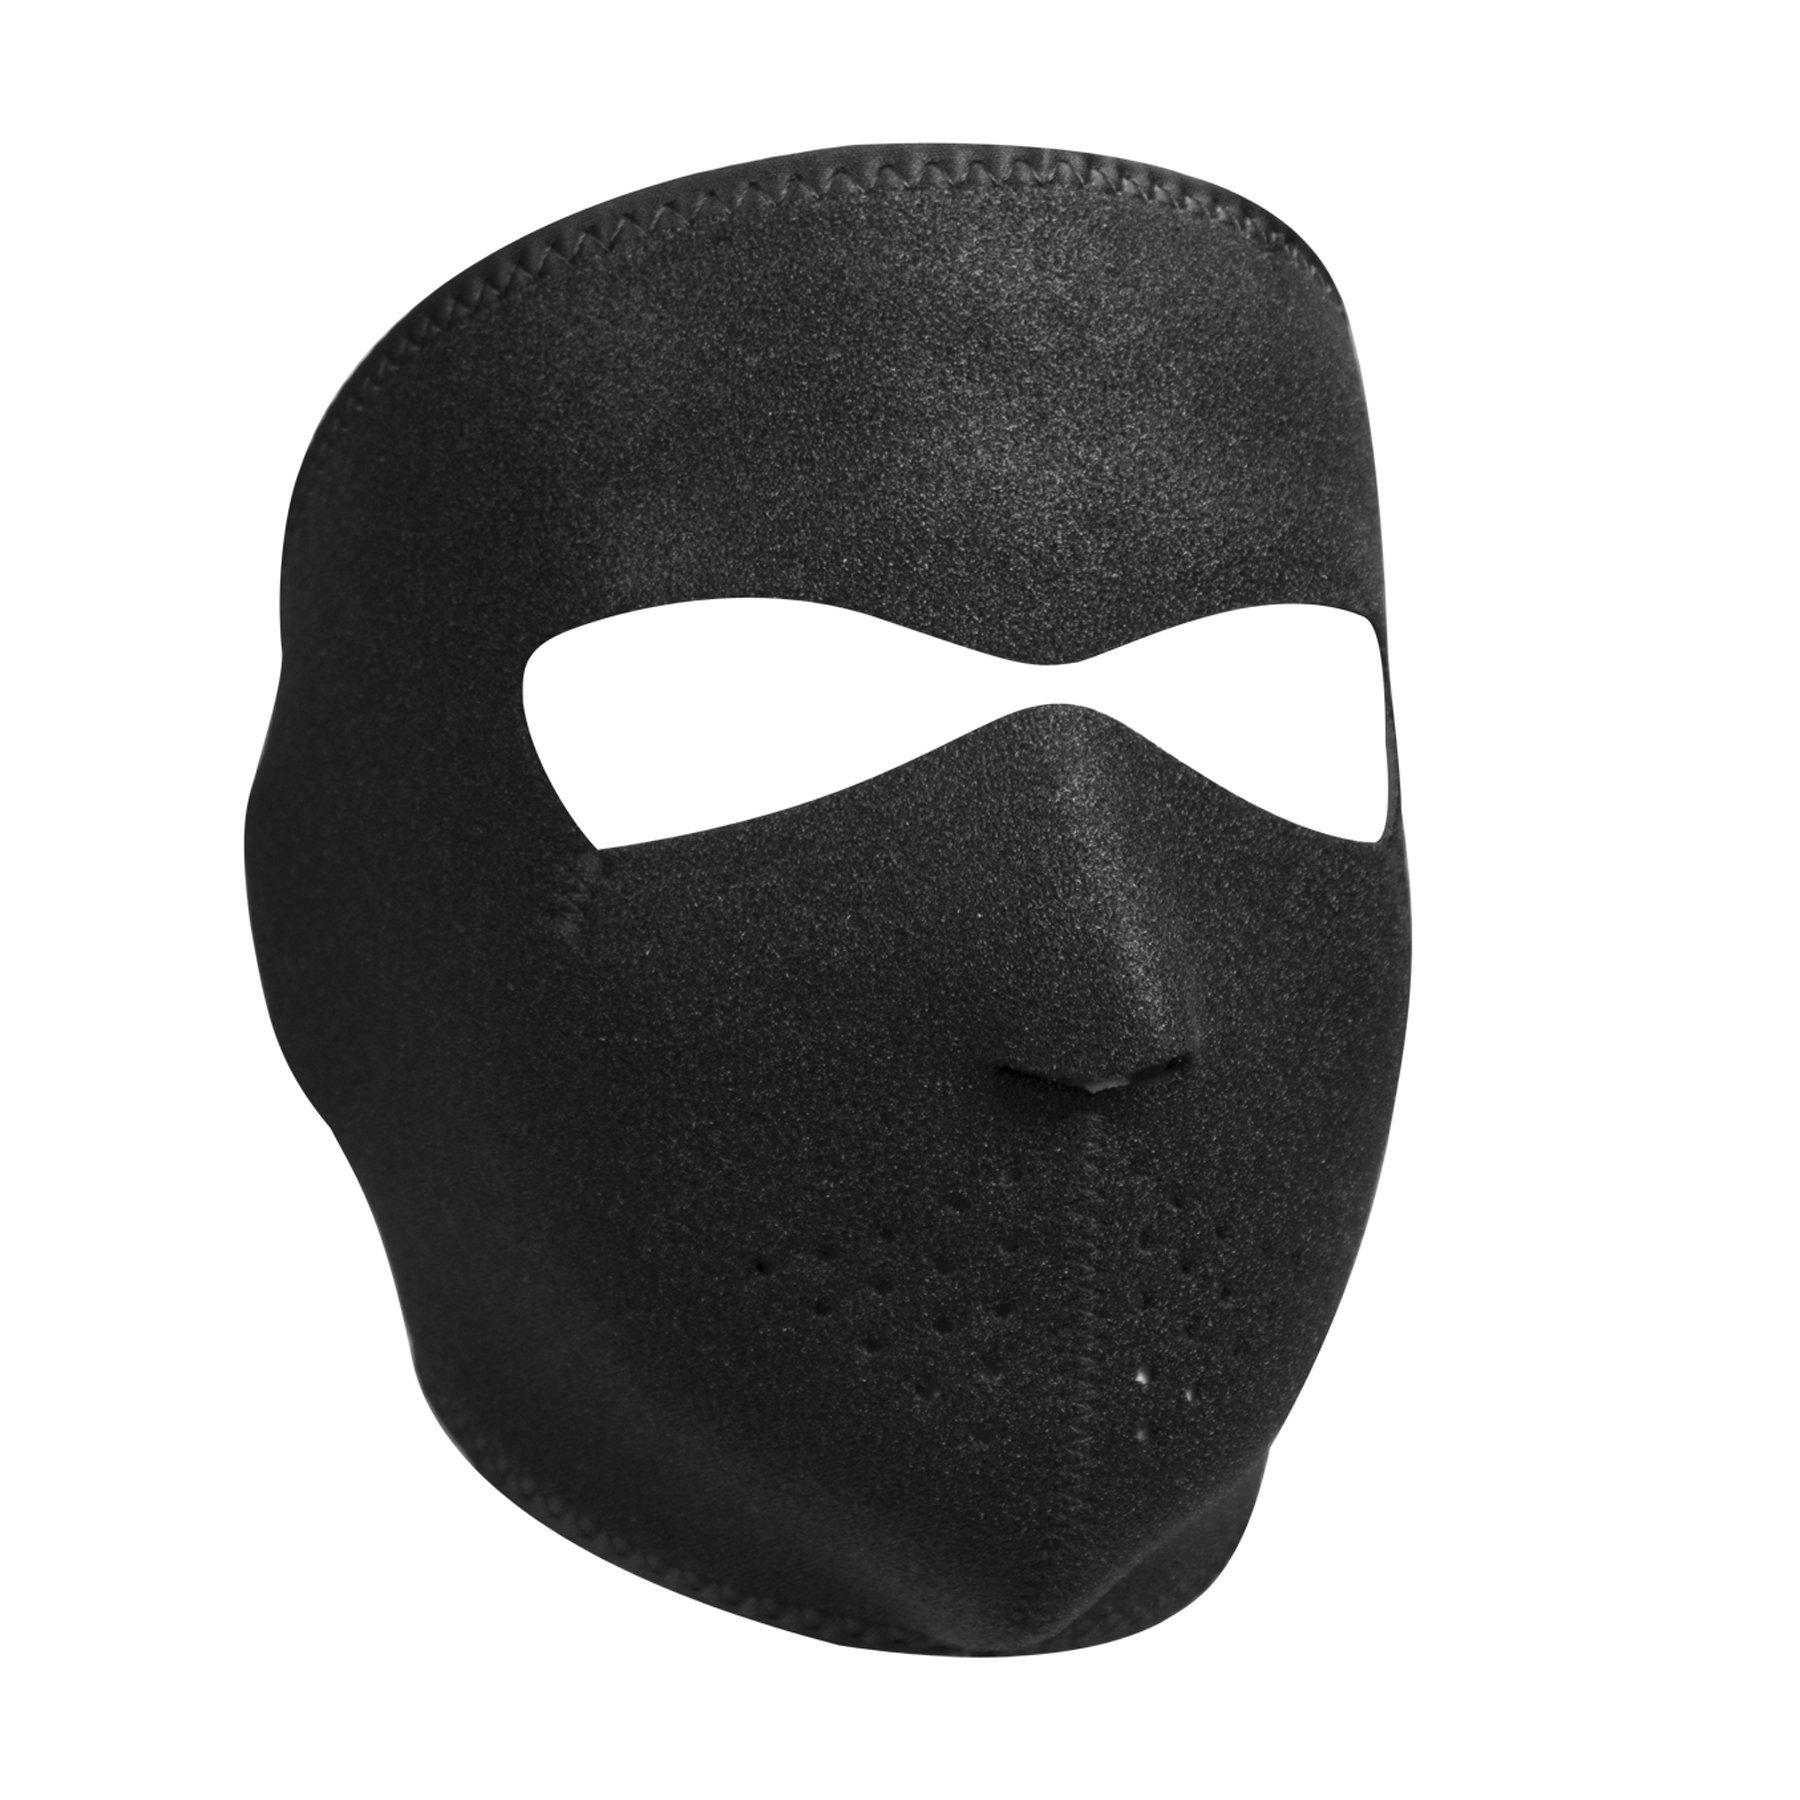 ZANheadgear WNFMV114 Neoprene Modi-Face Mask with Starter Pack, Adult Size, Black